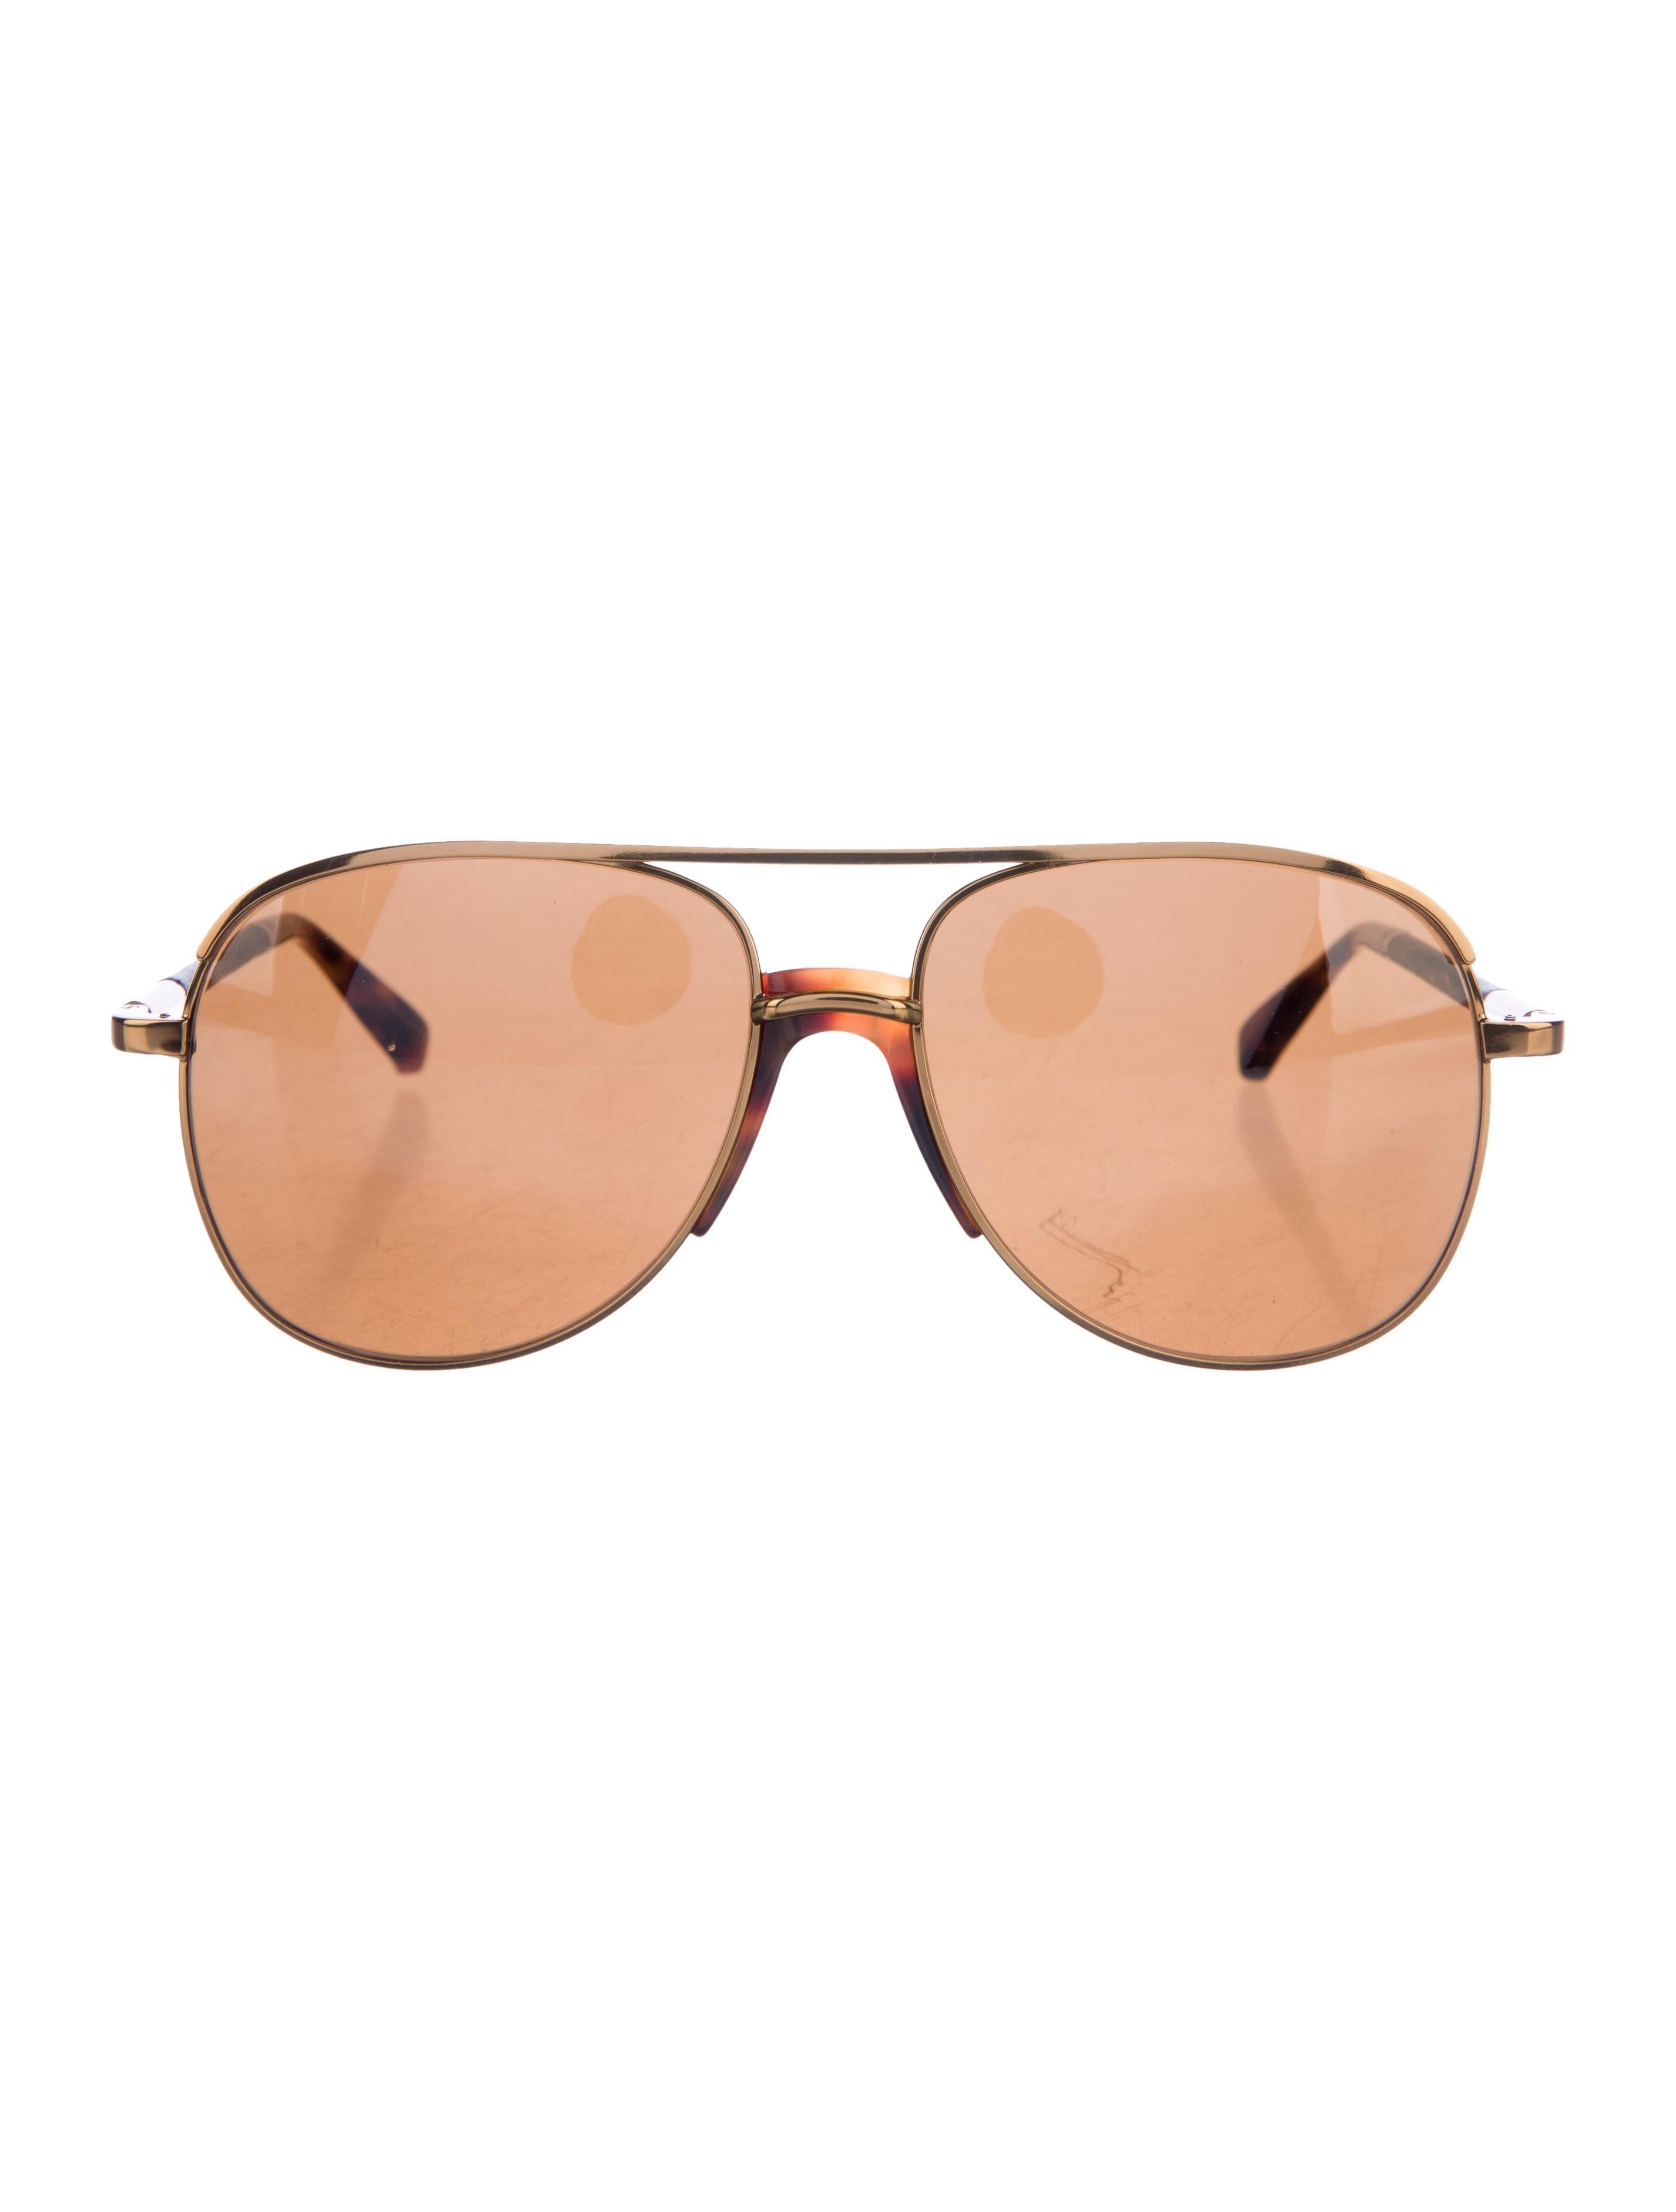 da98d1db5508 ... The Row x Linda Farrow Aviator Tinted Sunglasses. Aviator Tinted  Sunglasses